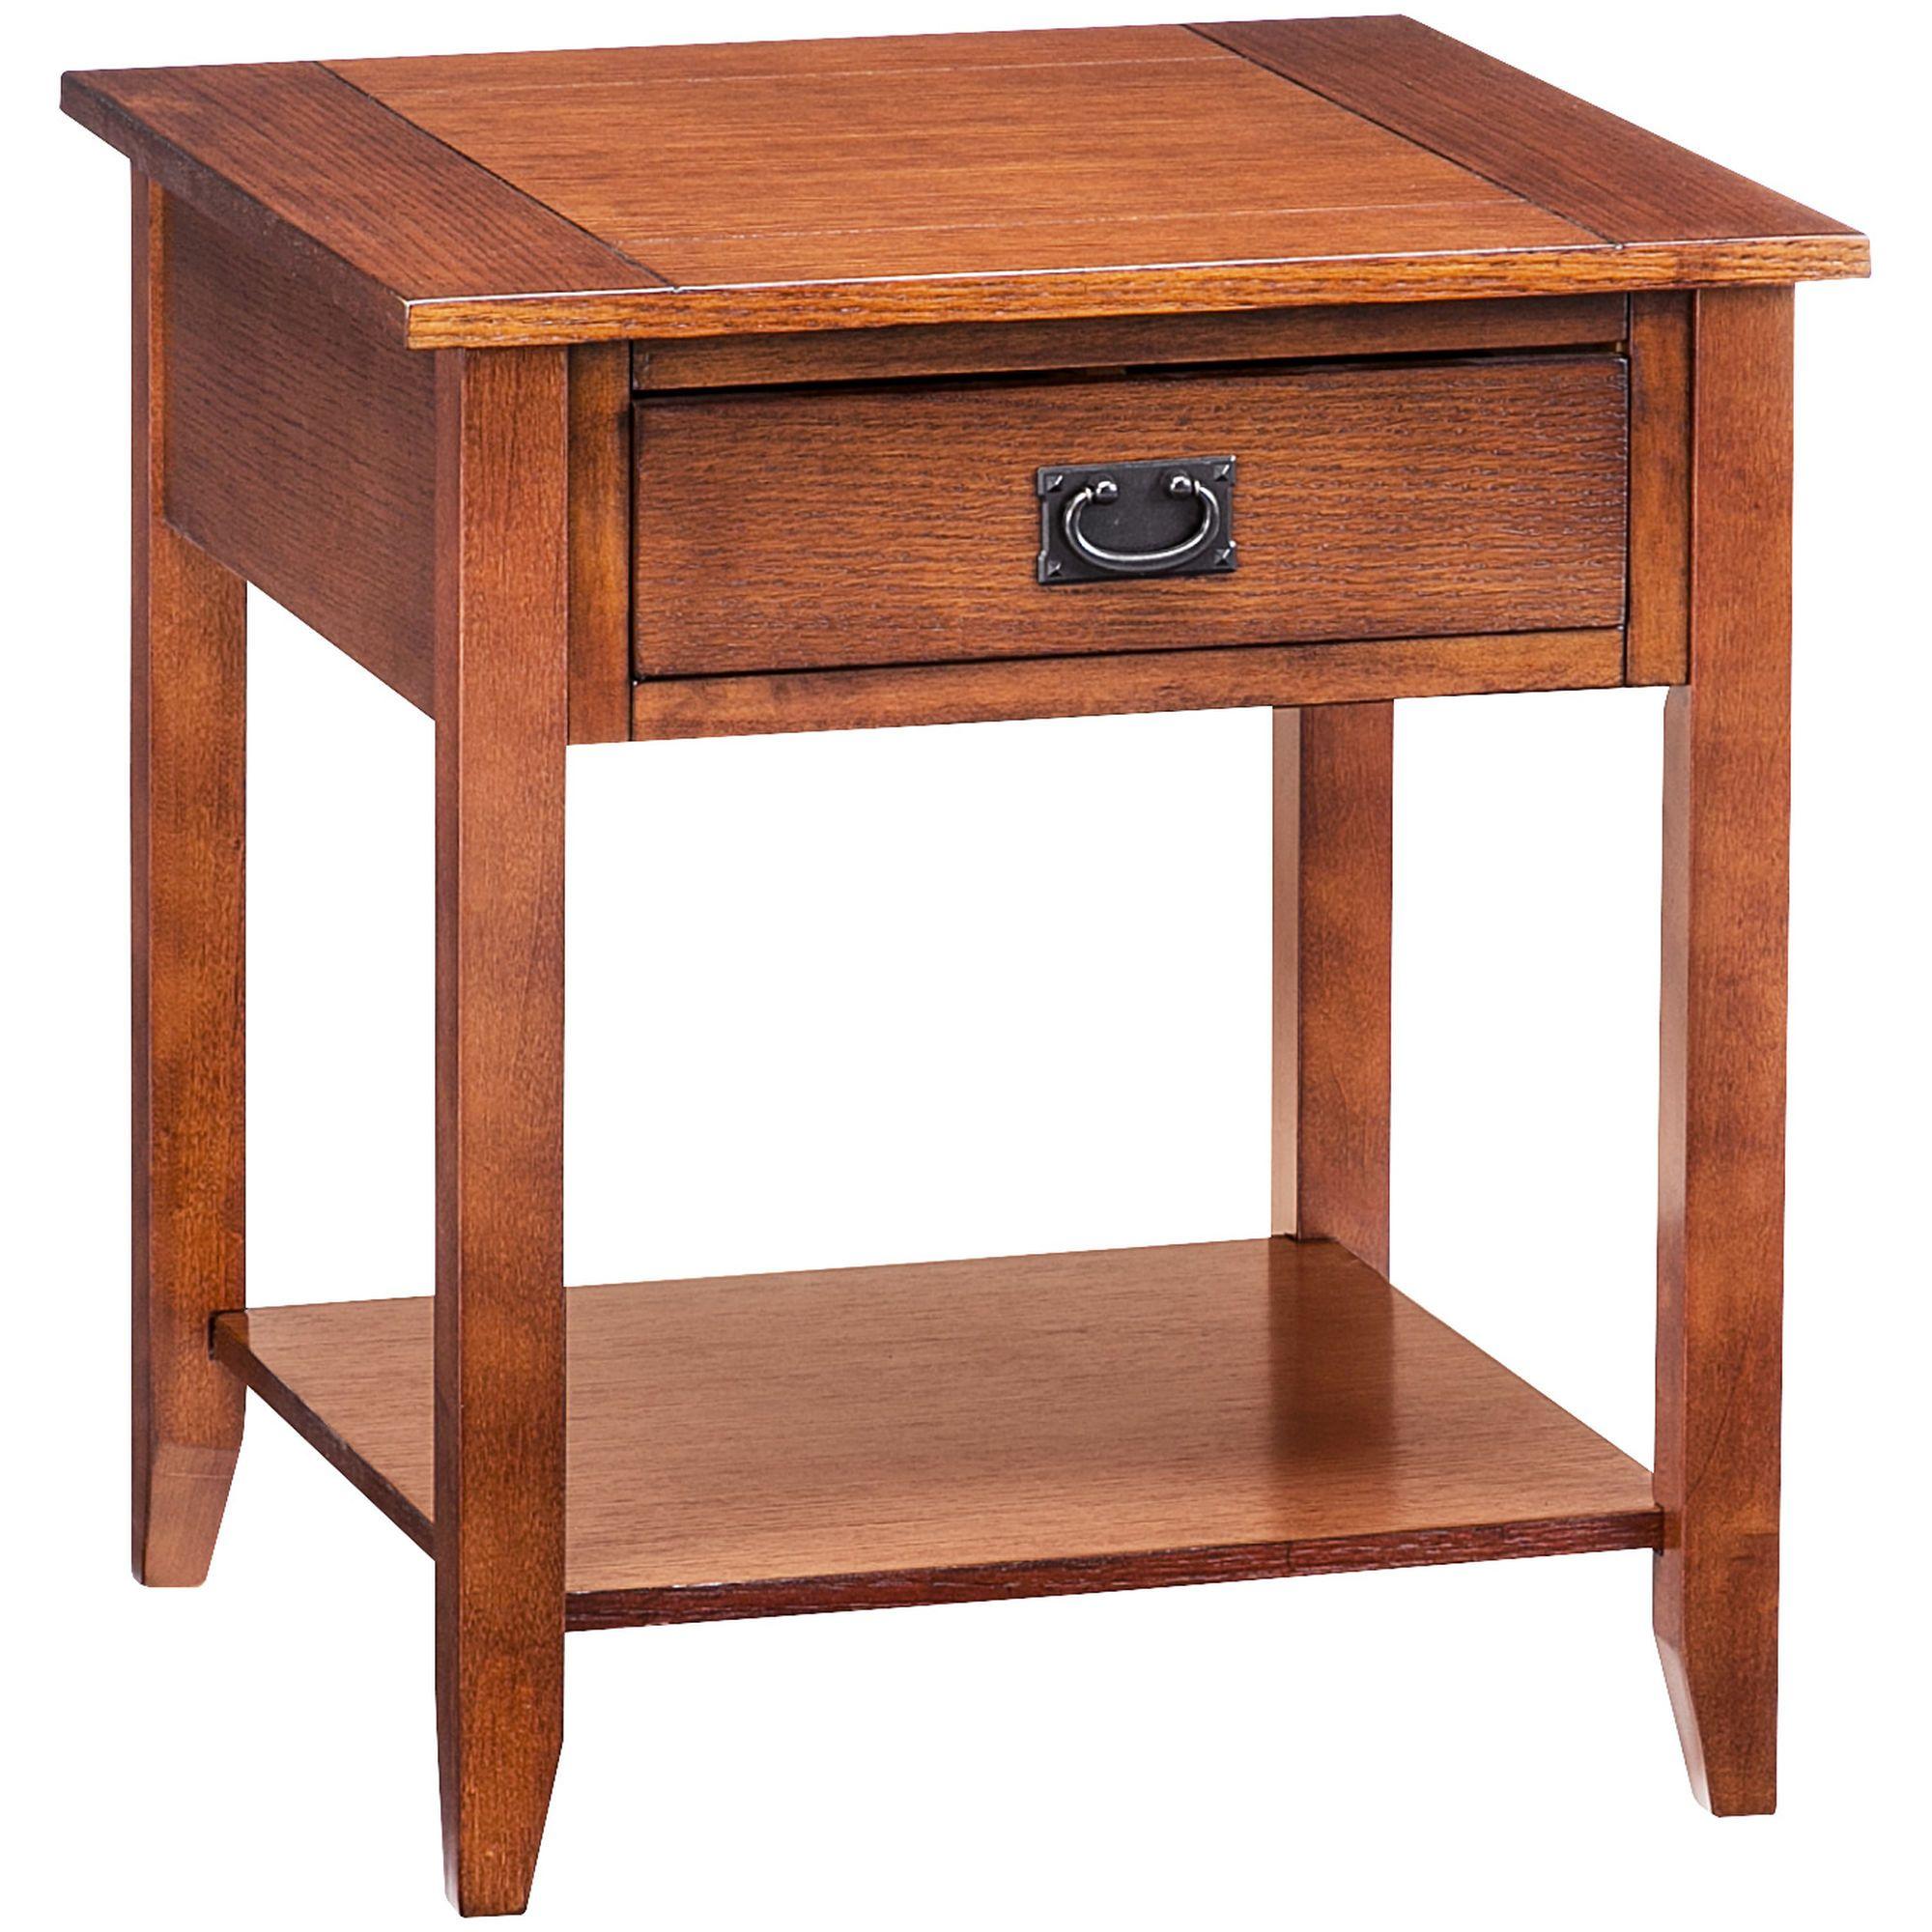 Admirable Slumberland Furniture Rutledge Oak End Table Furniture Pdpeps Interior Chair Design Pdpepsorg